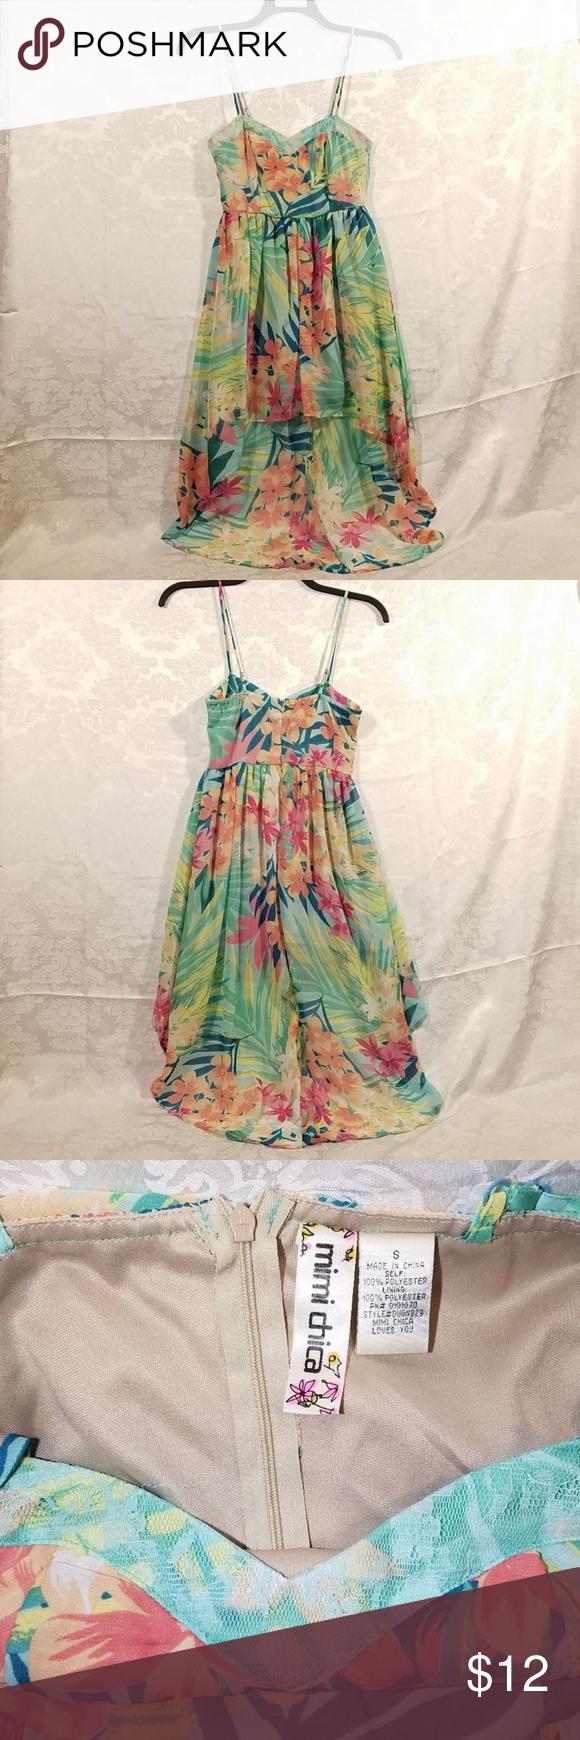 Mimi chica spring summer high low dress juniors lovely dresses